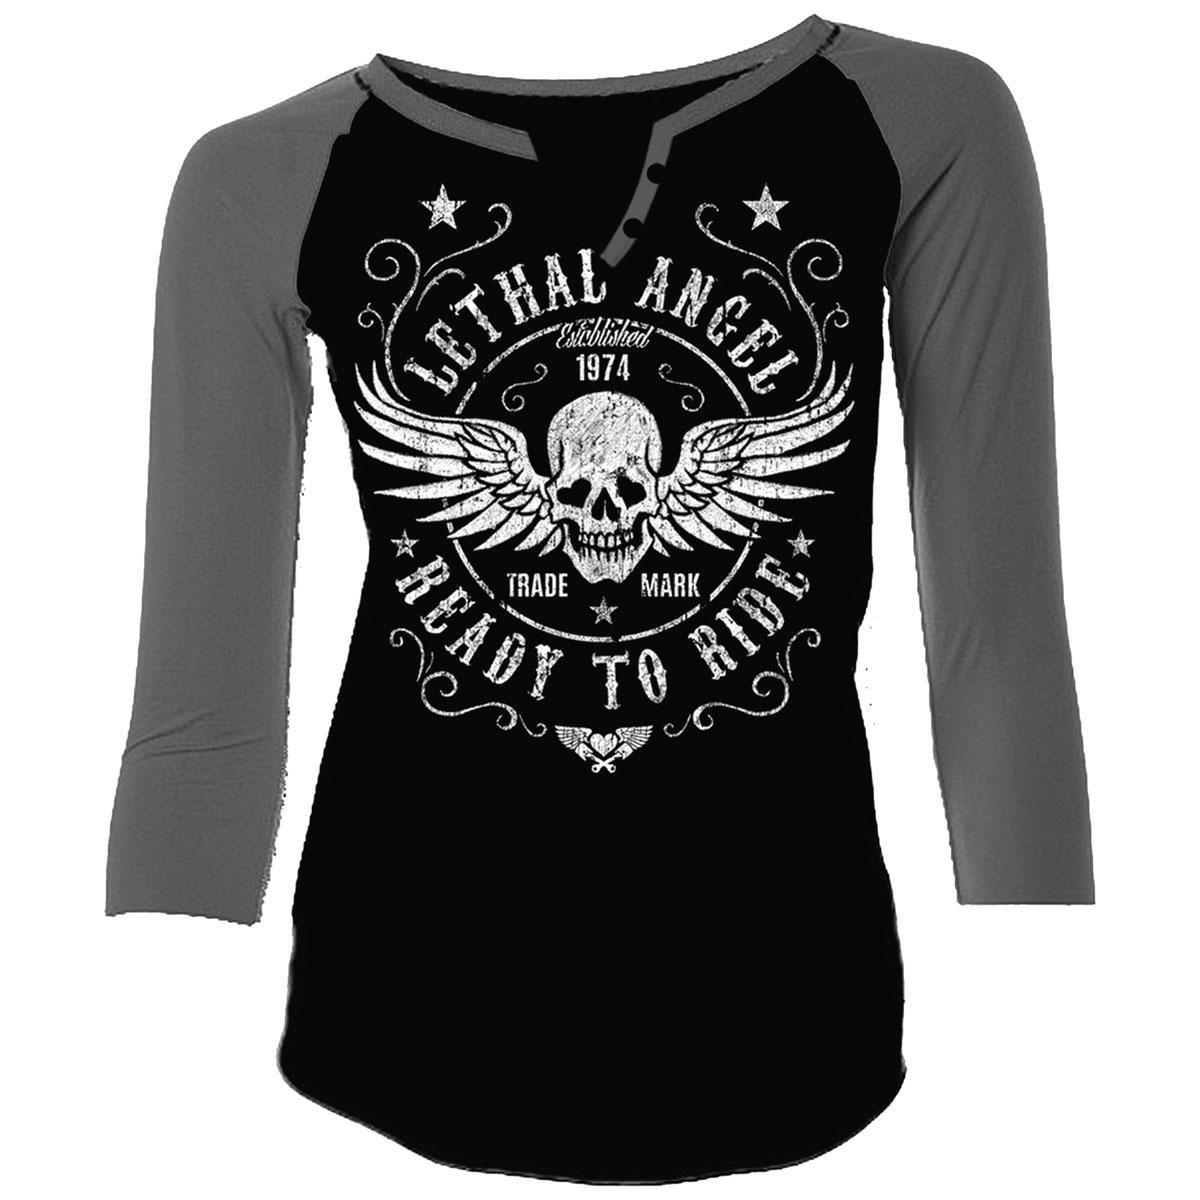 Lethal Angel Women's Ready to Ride Curvy Black/Gray Baseball Tee